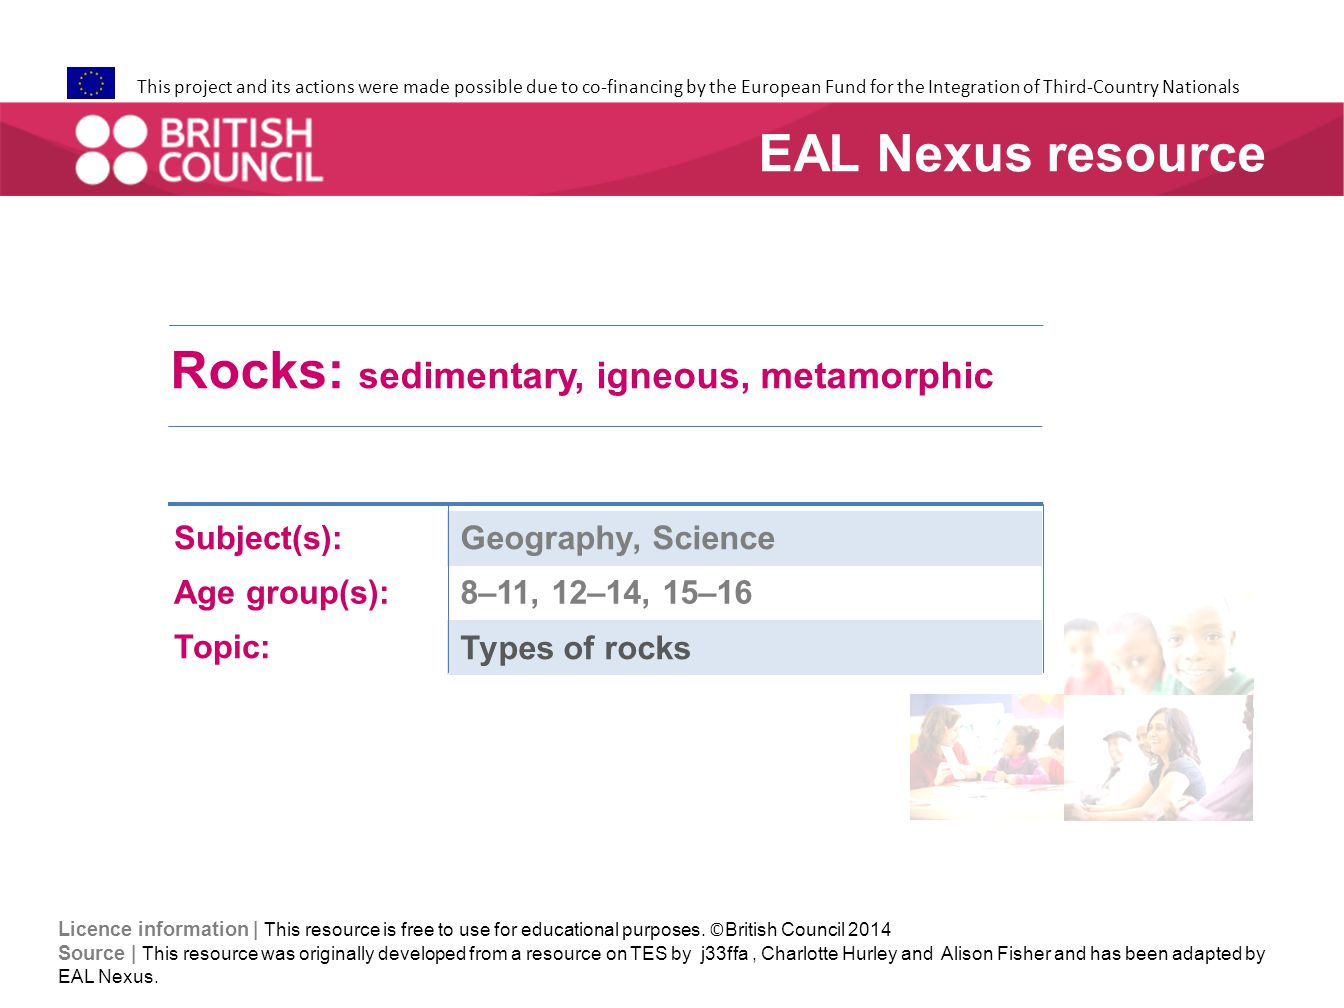 Rocks: sedimentary, igneous, metamorphic